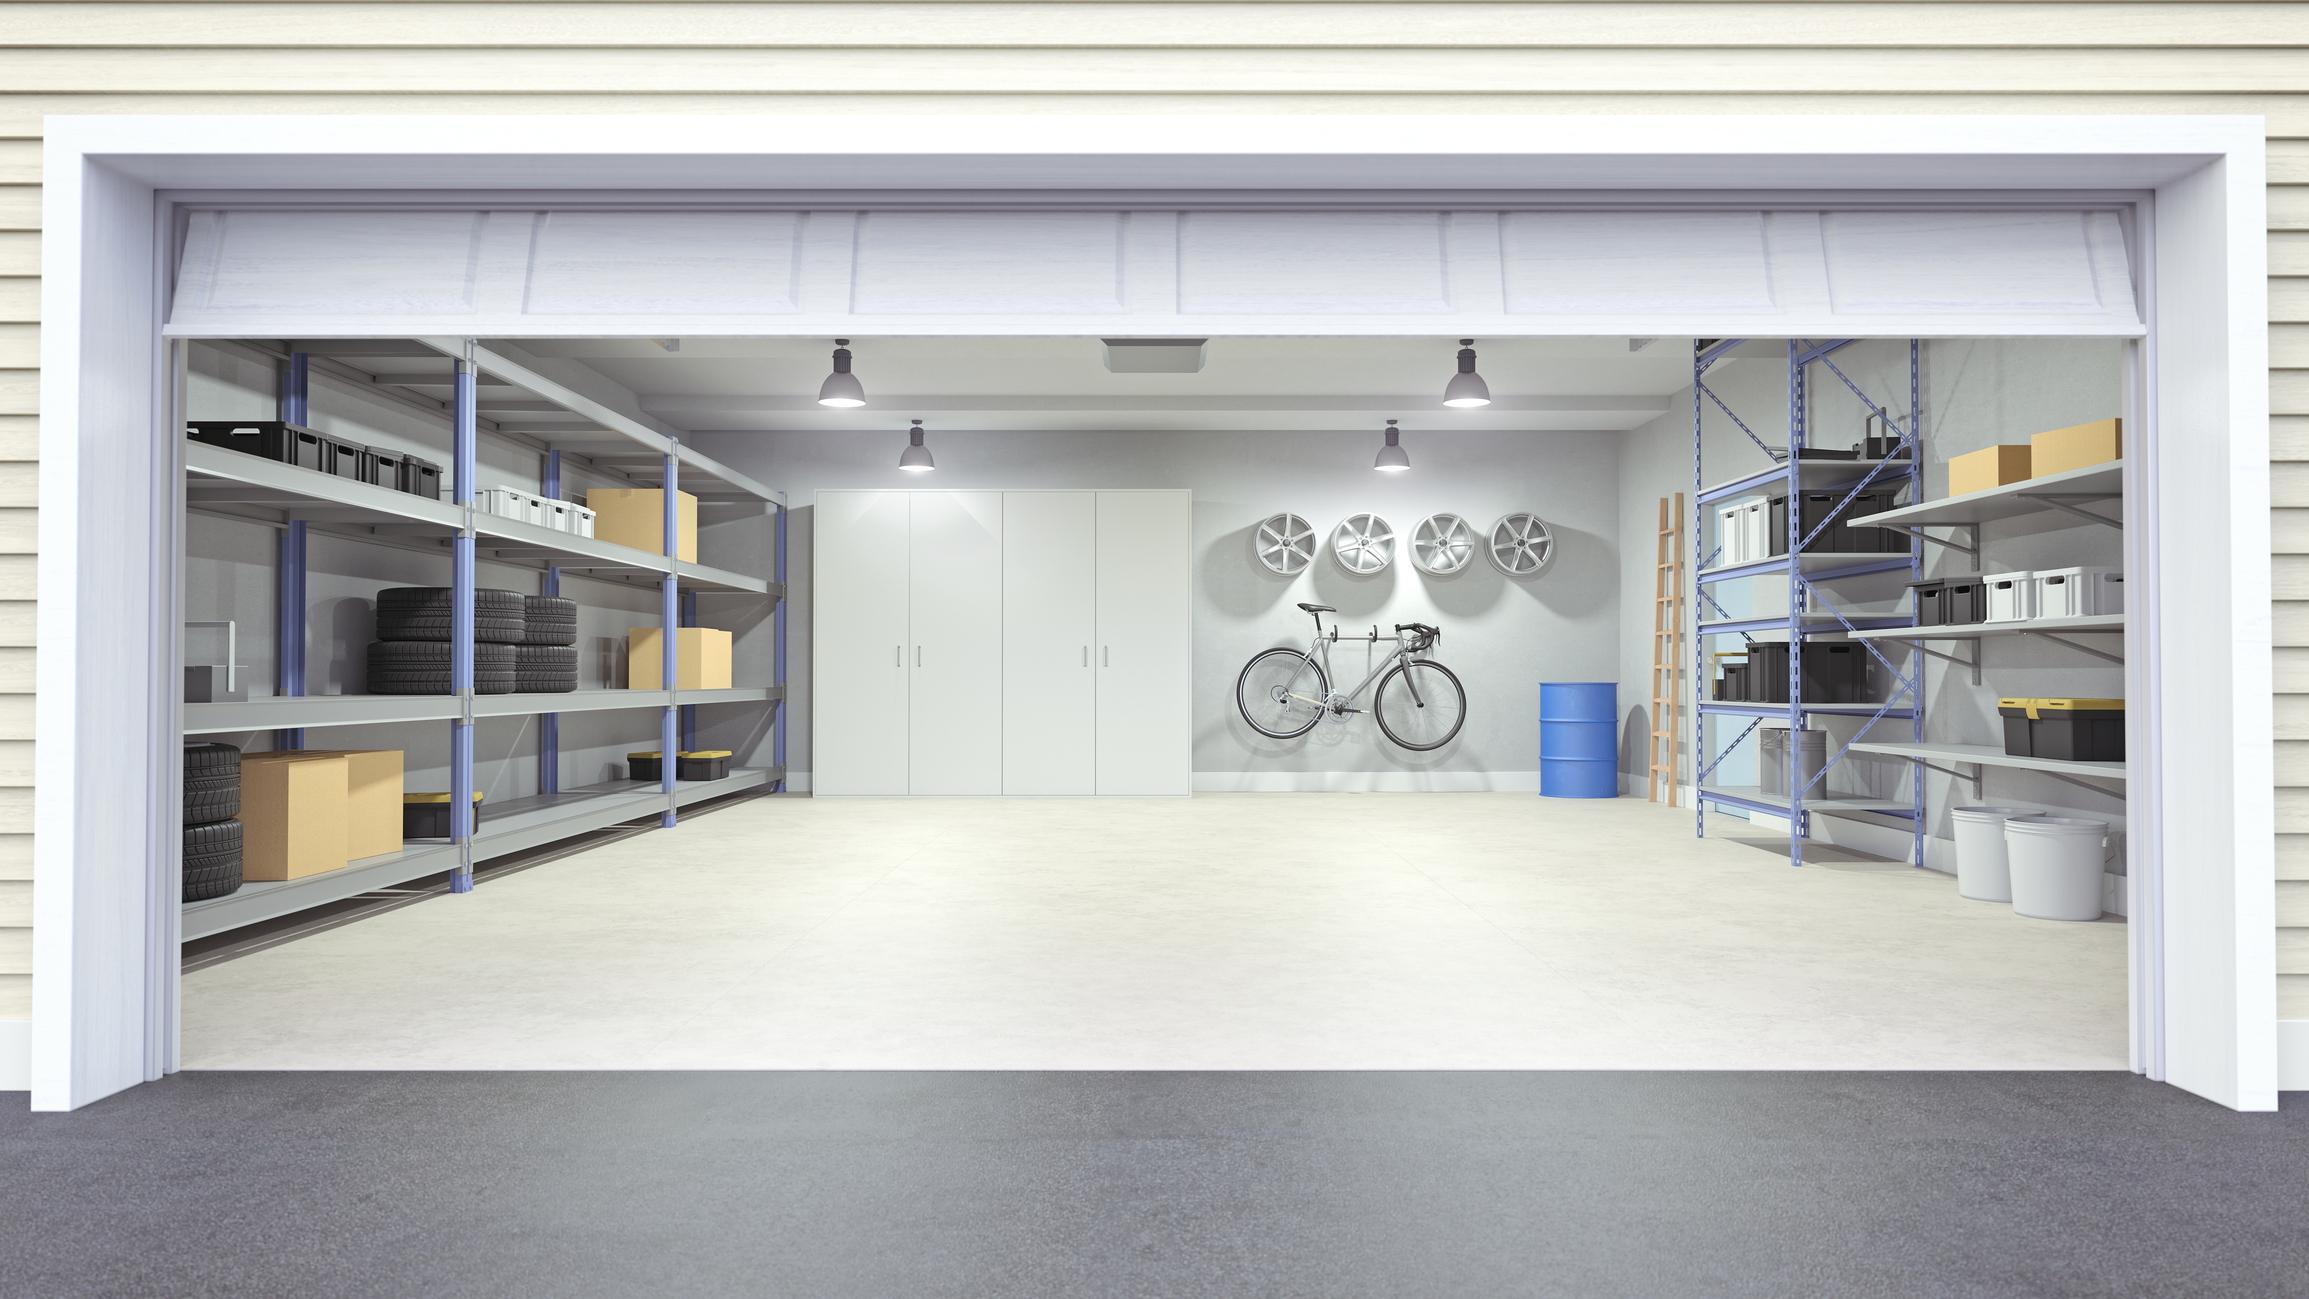 Epoxy coating in garage.